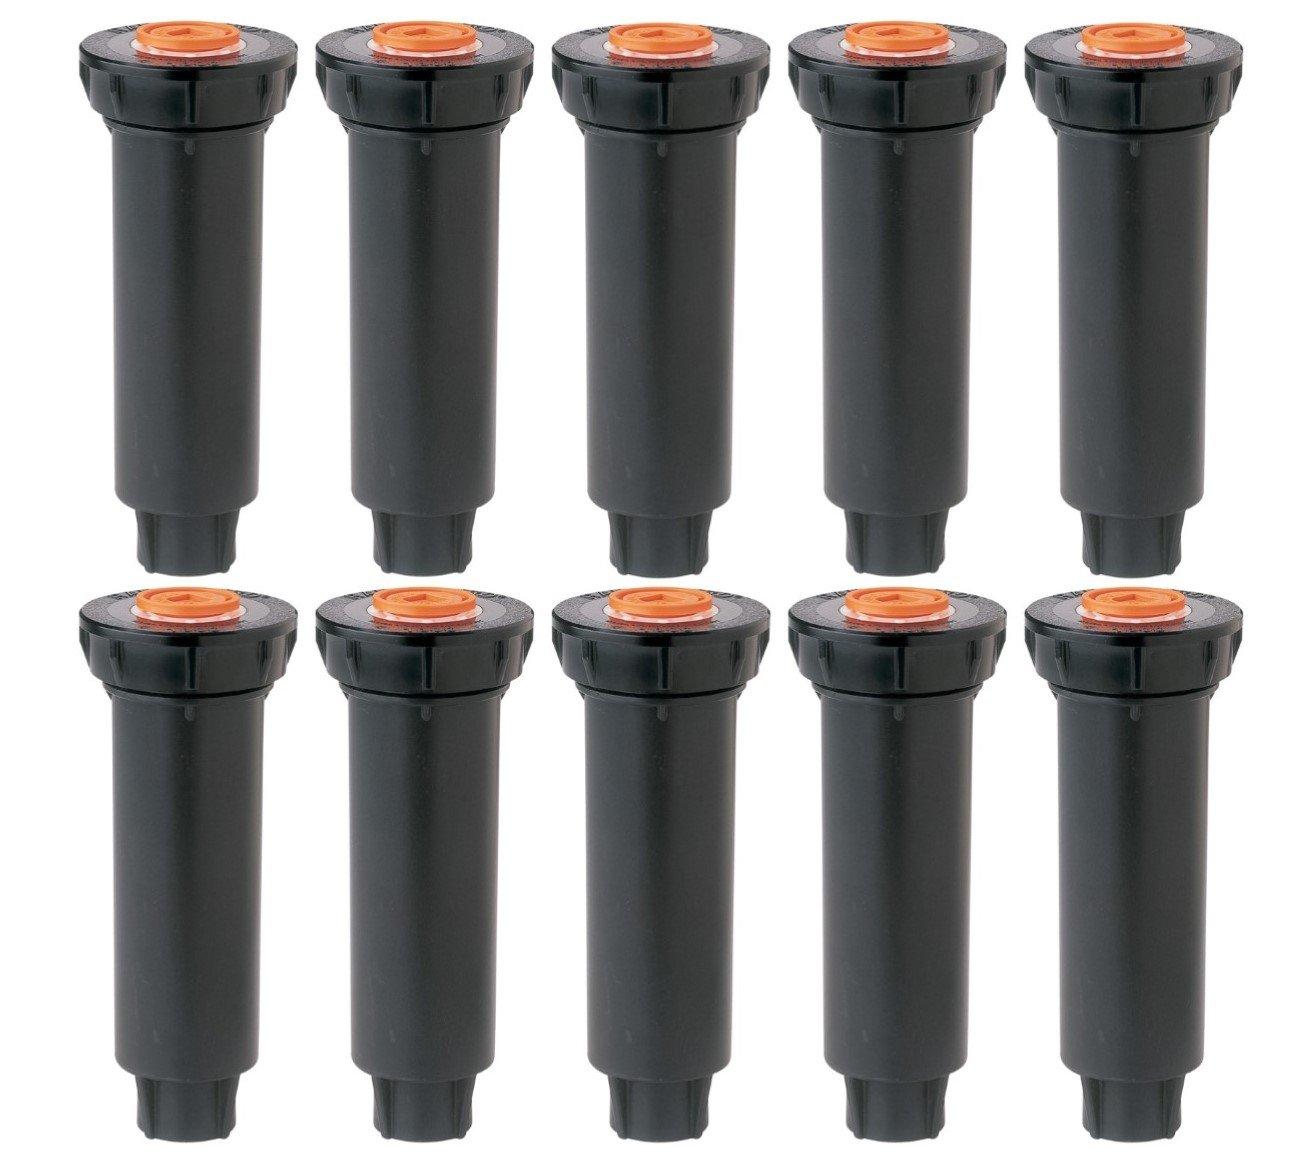 Rain Bird 1800 Series Pop-Up Sprinklers 10 PACK - Nozzles NOT included -  RainBird 4